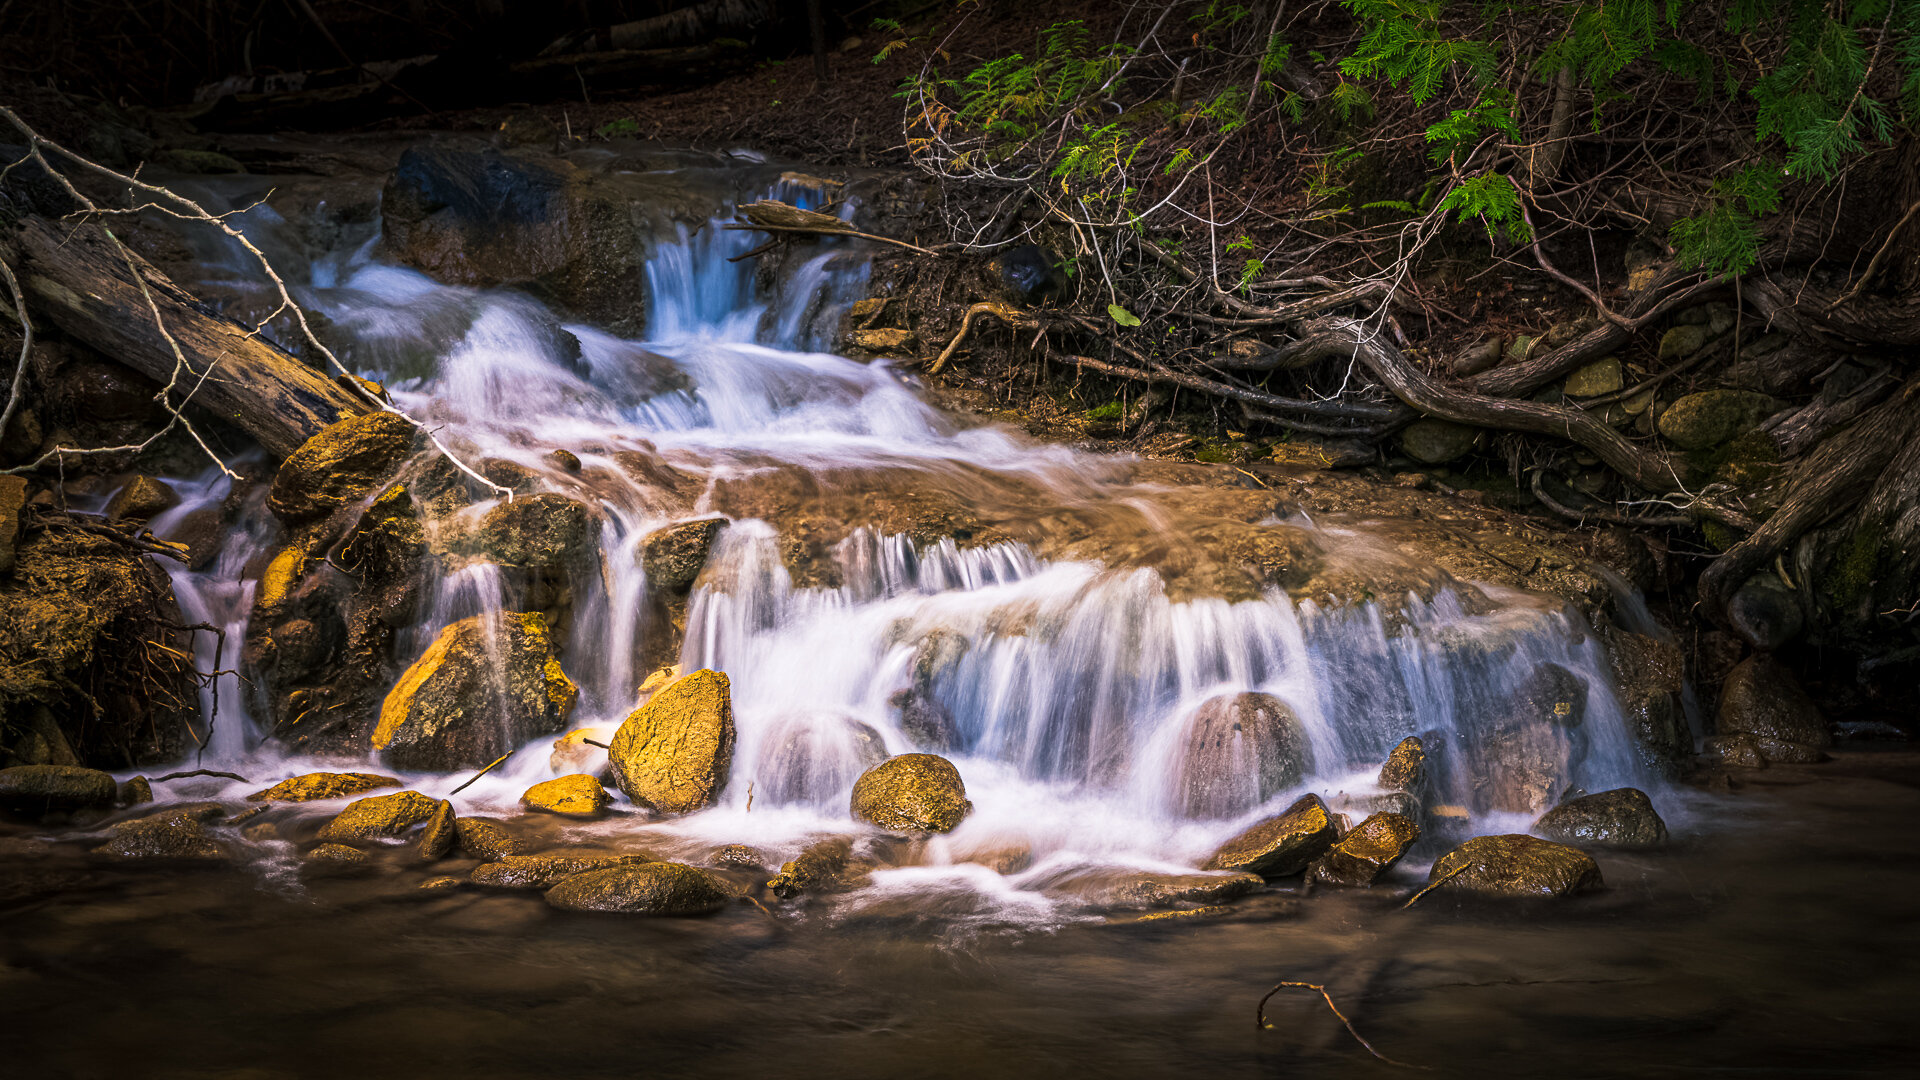 Nottawassaga Creek Waterfall